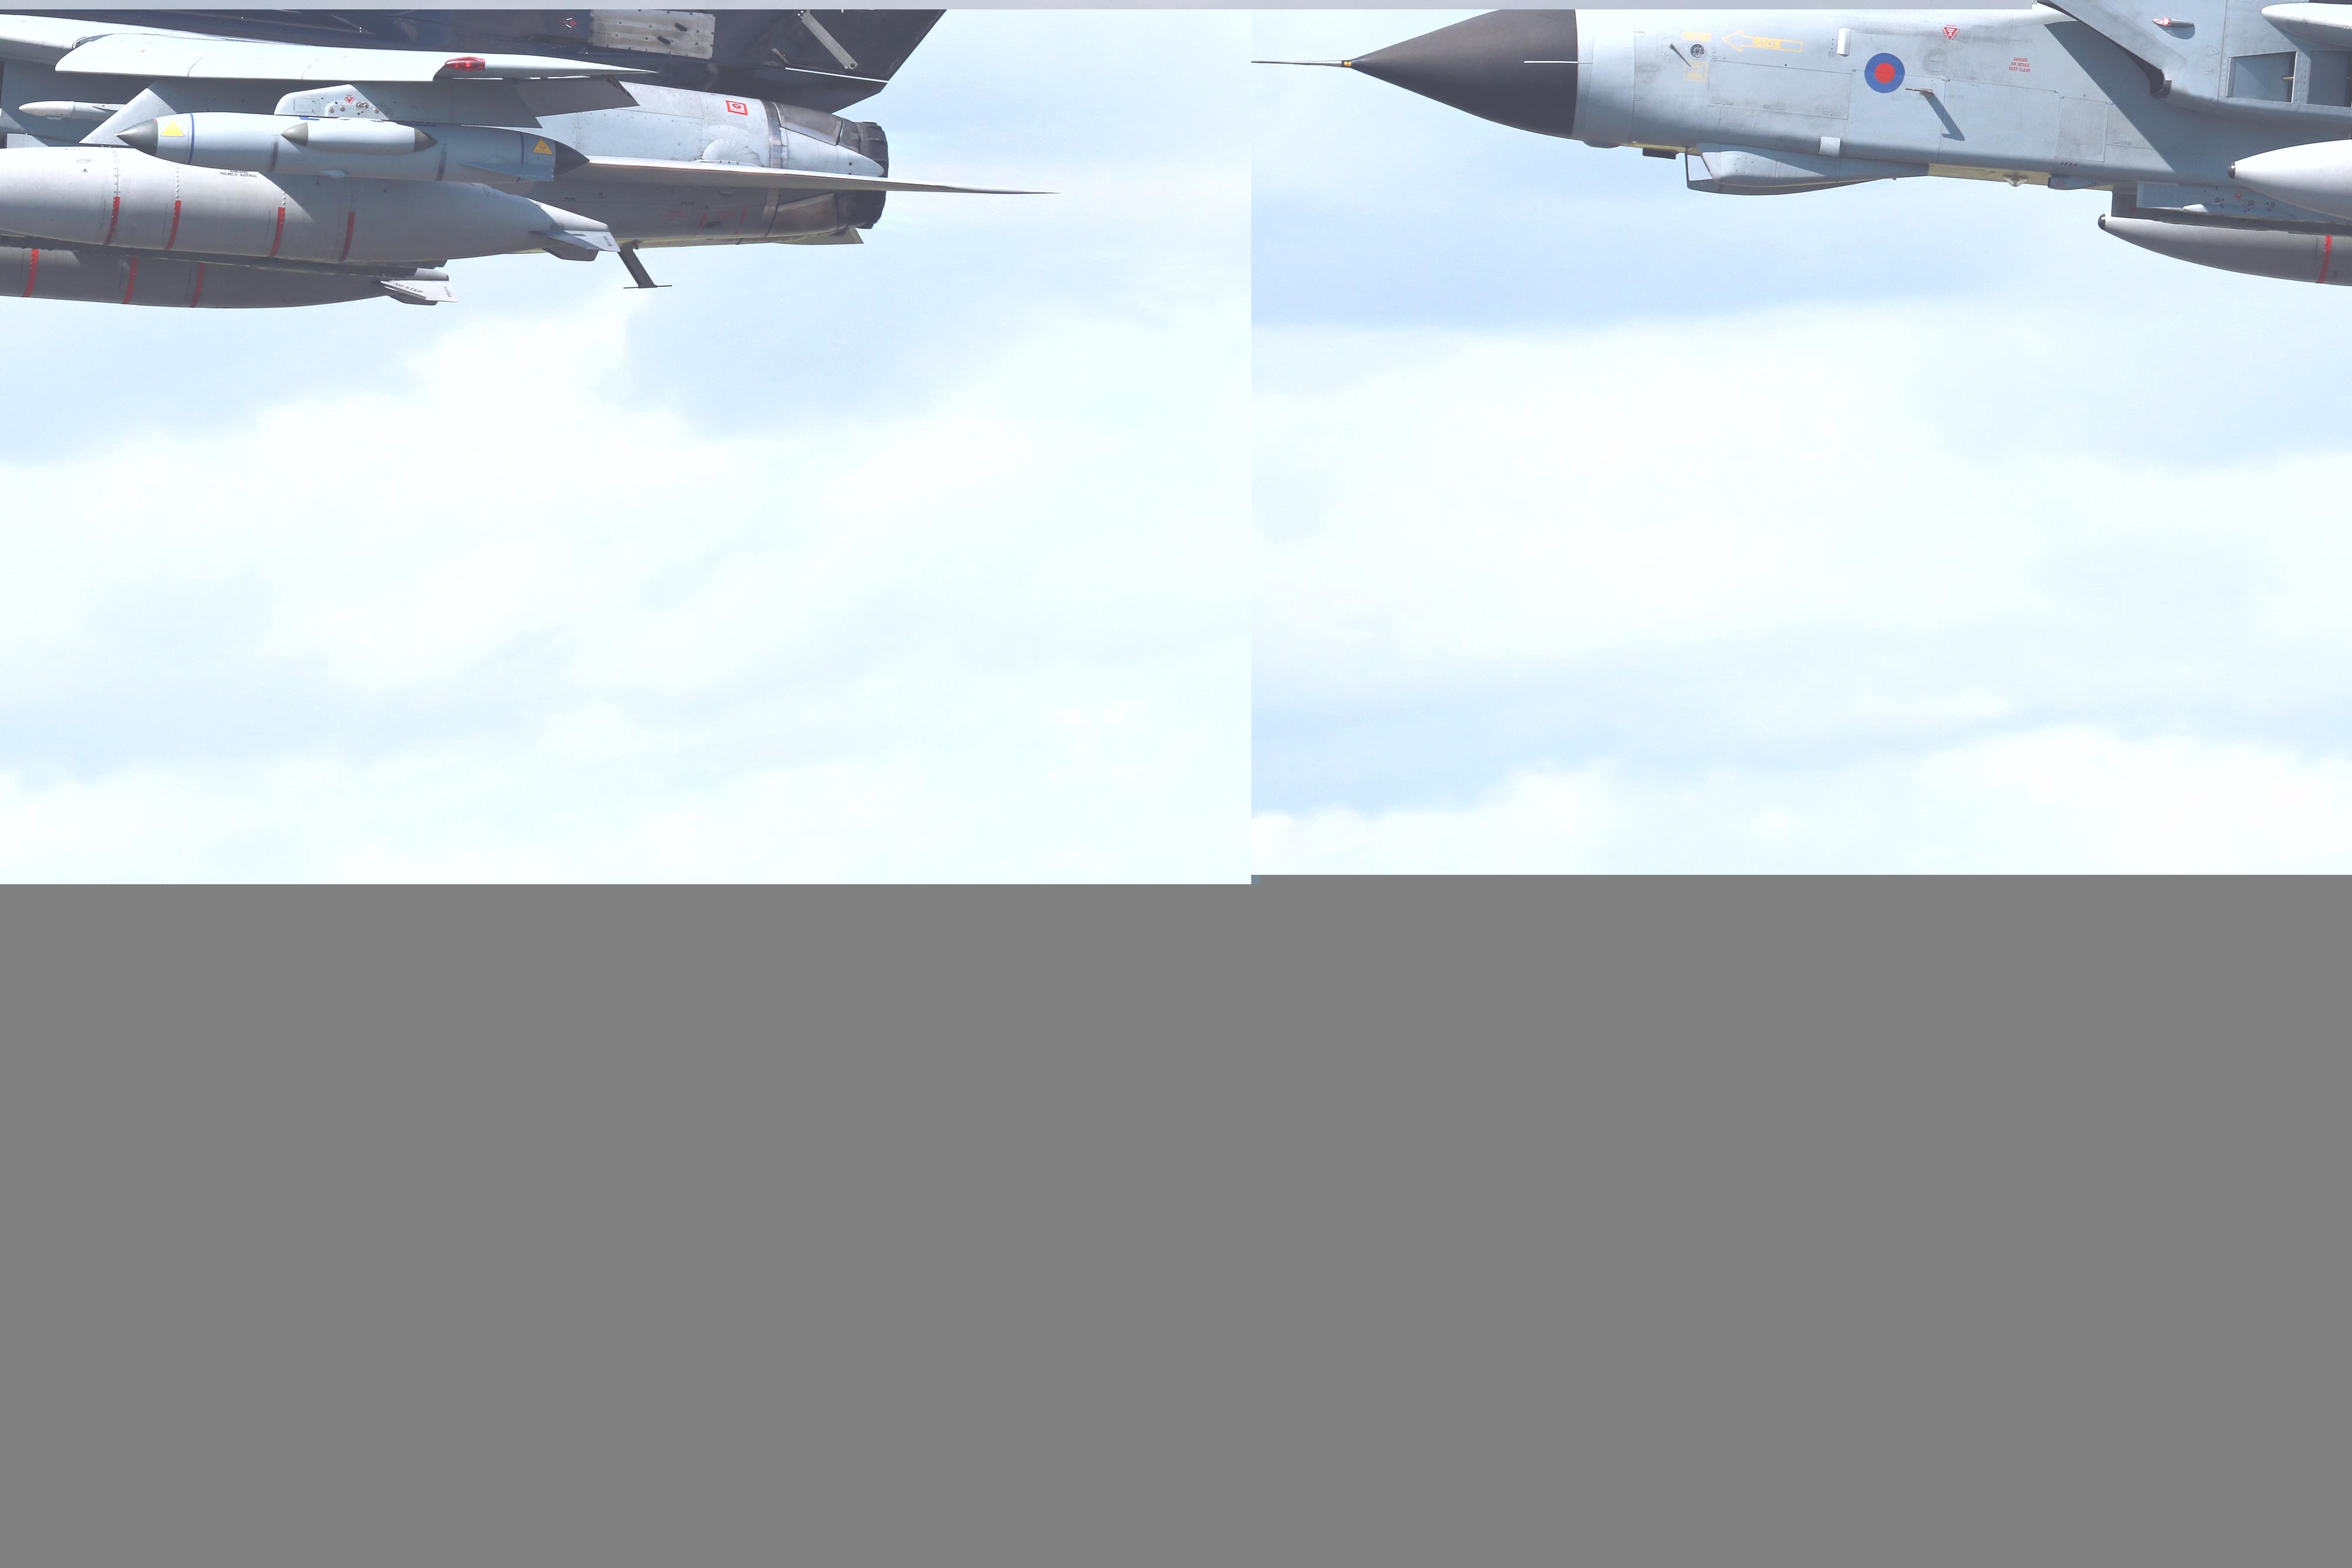 RIAT 2016 RAF Fairford  –  Part 5